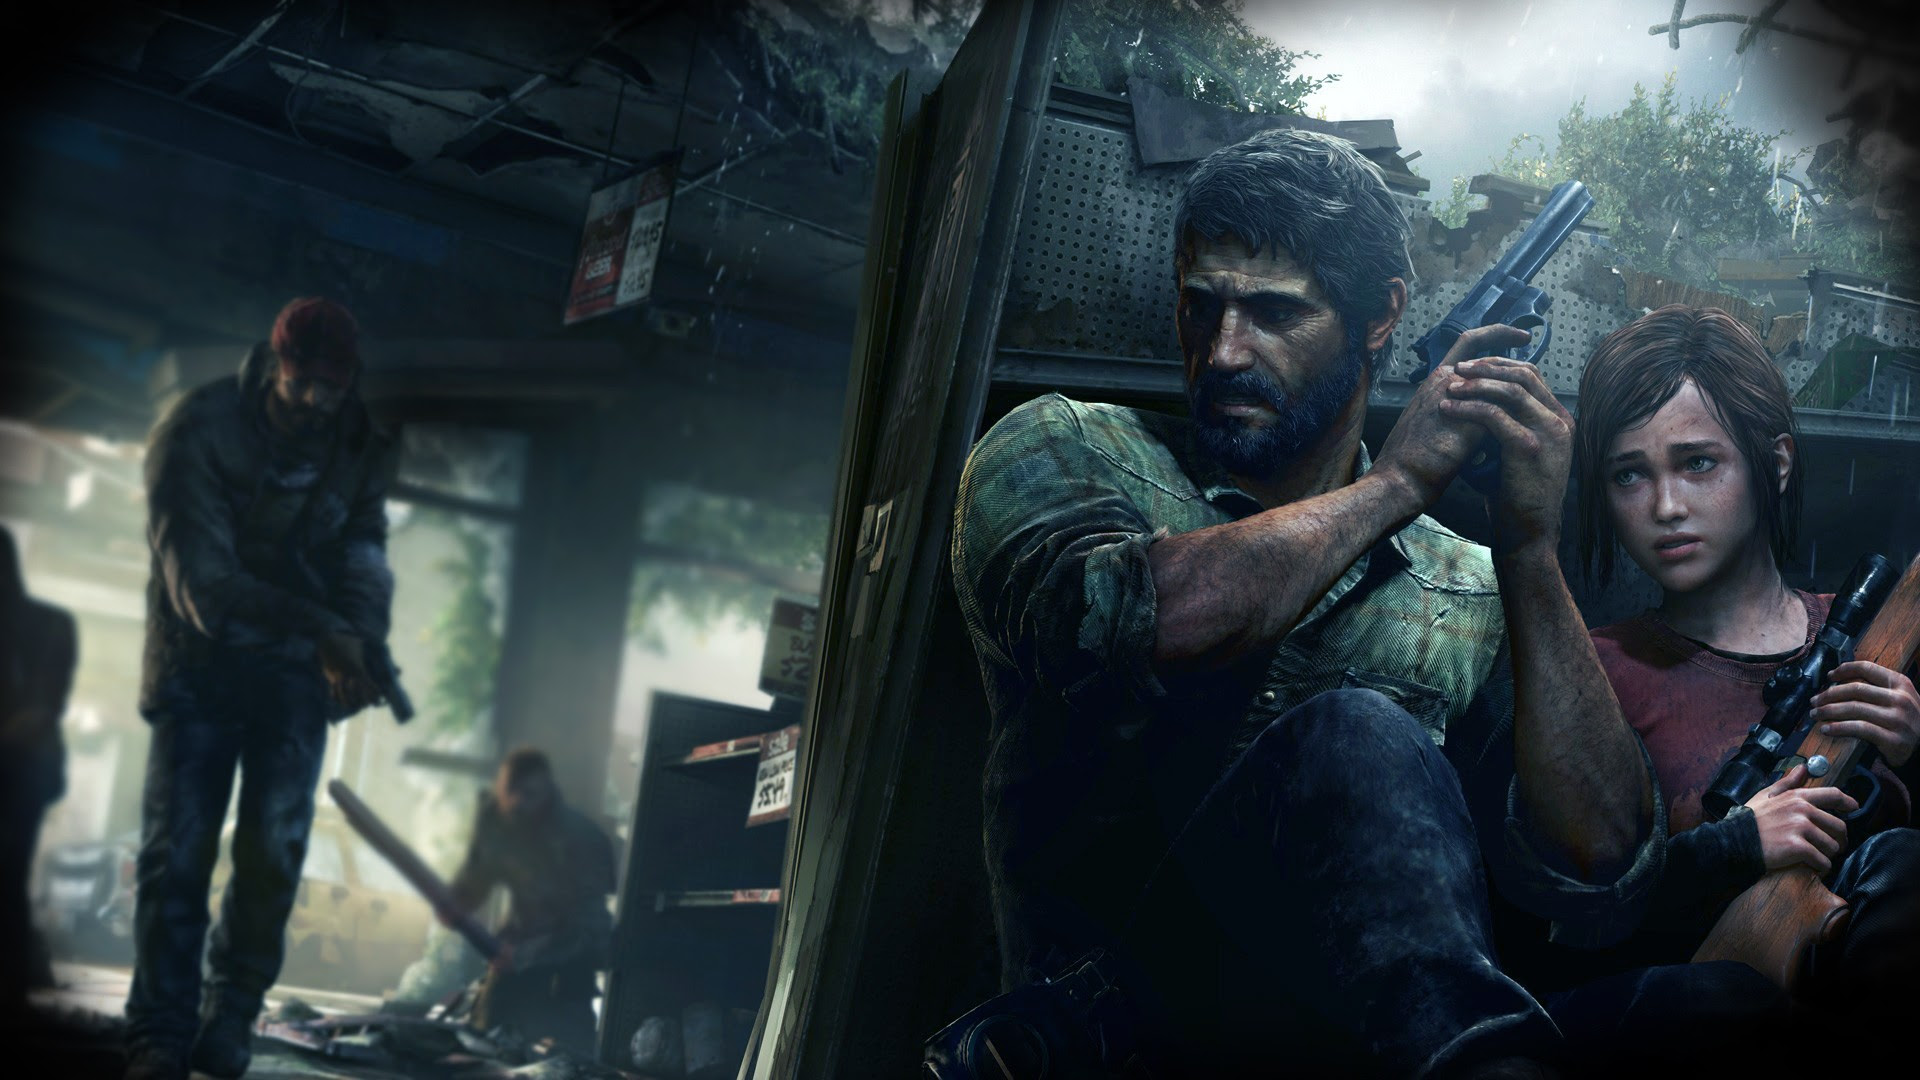 The Last Of Us Wallpaper 1920x1080 67986